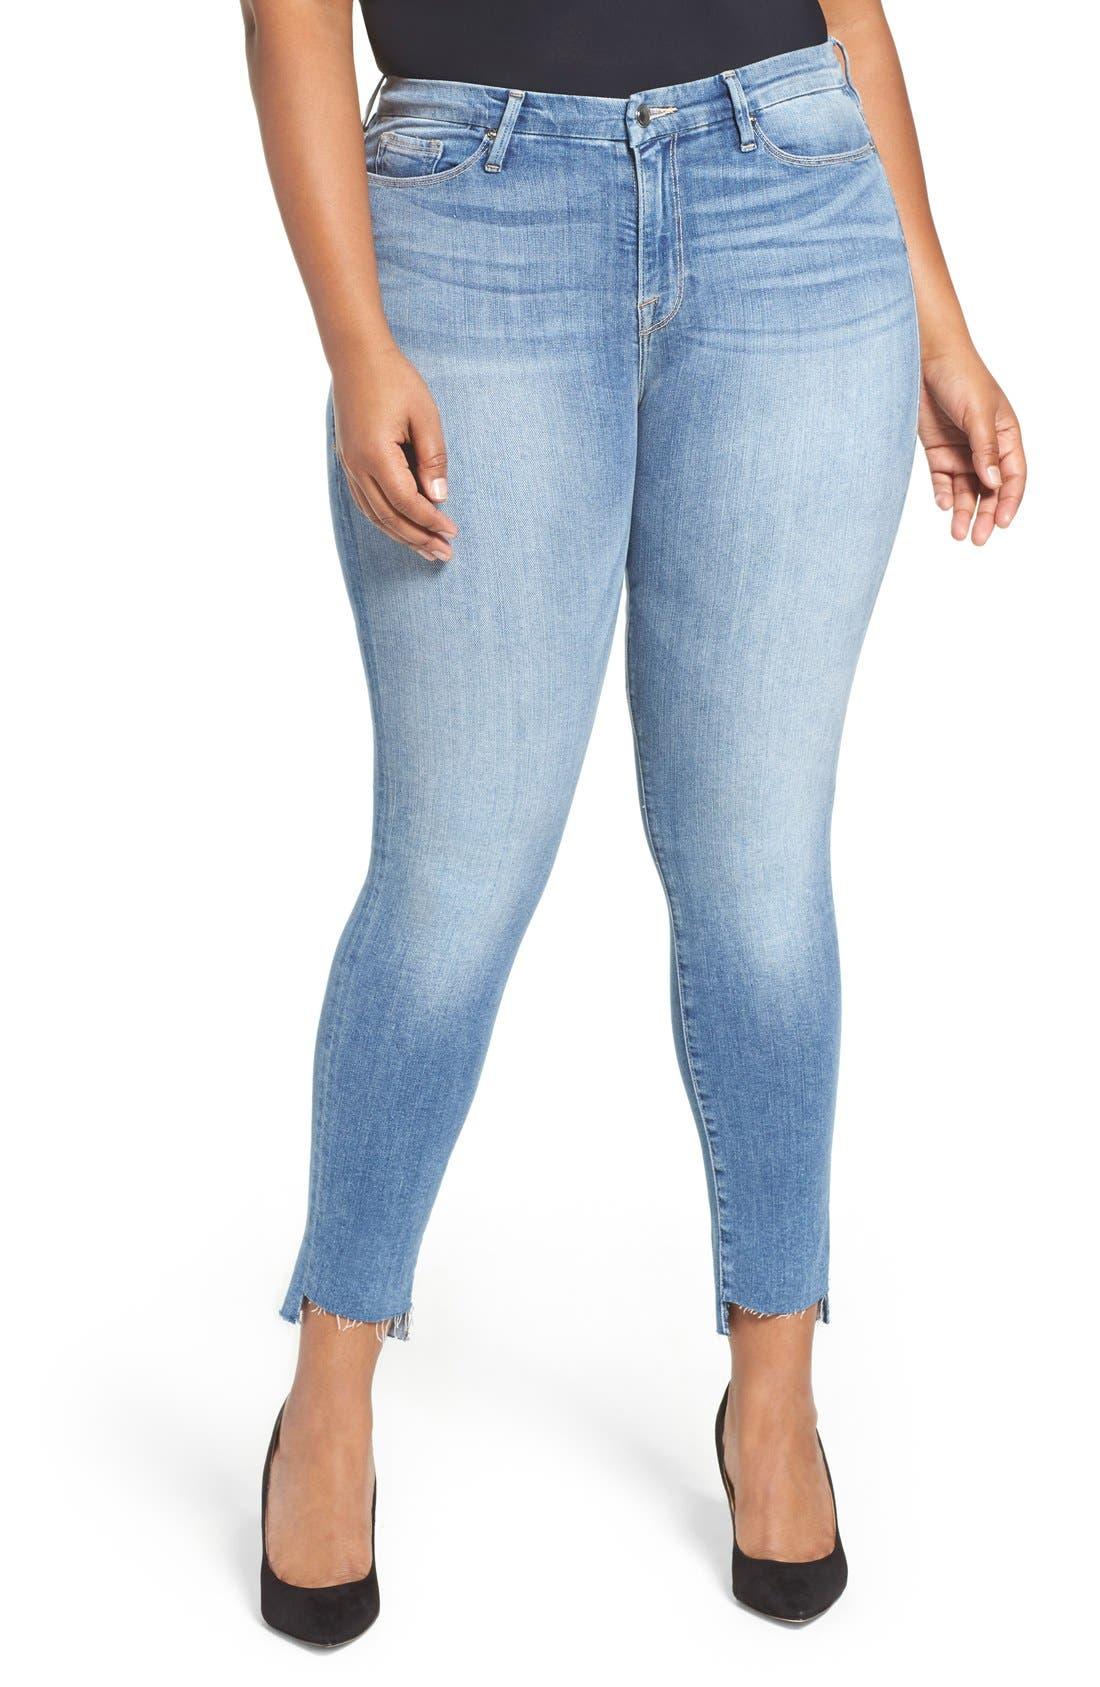 Alternate Image 1 Selected - Good American Good Legs High Rise Raw Step Hem Skinny Jeans